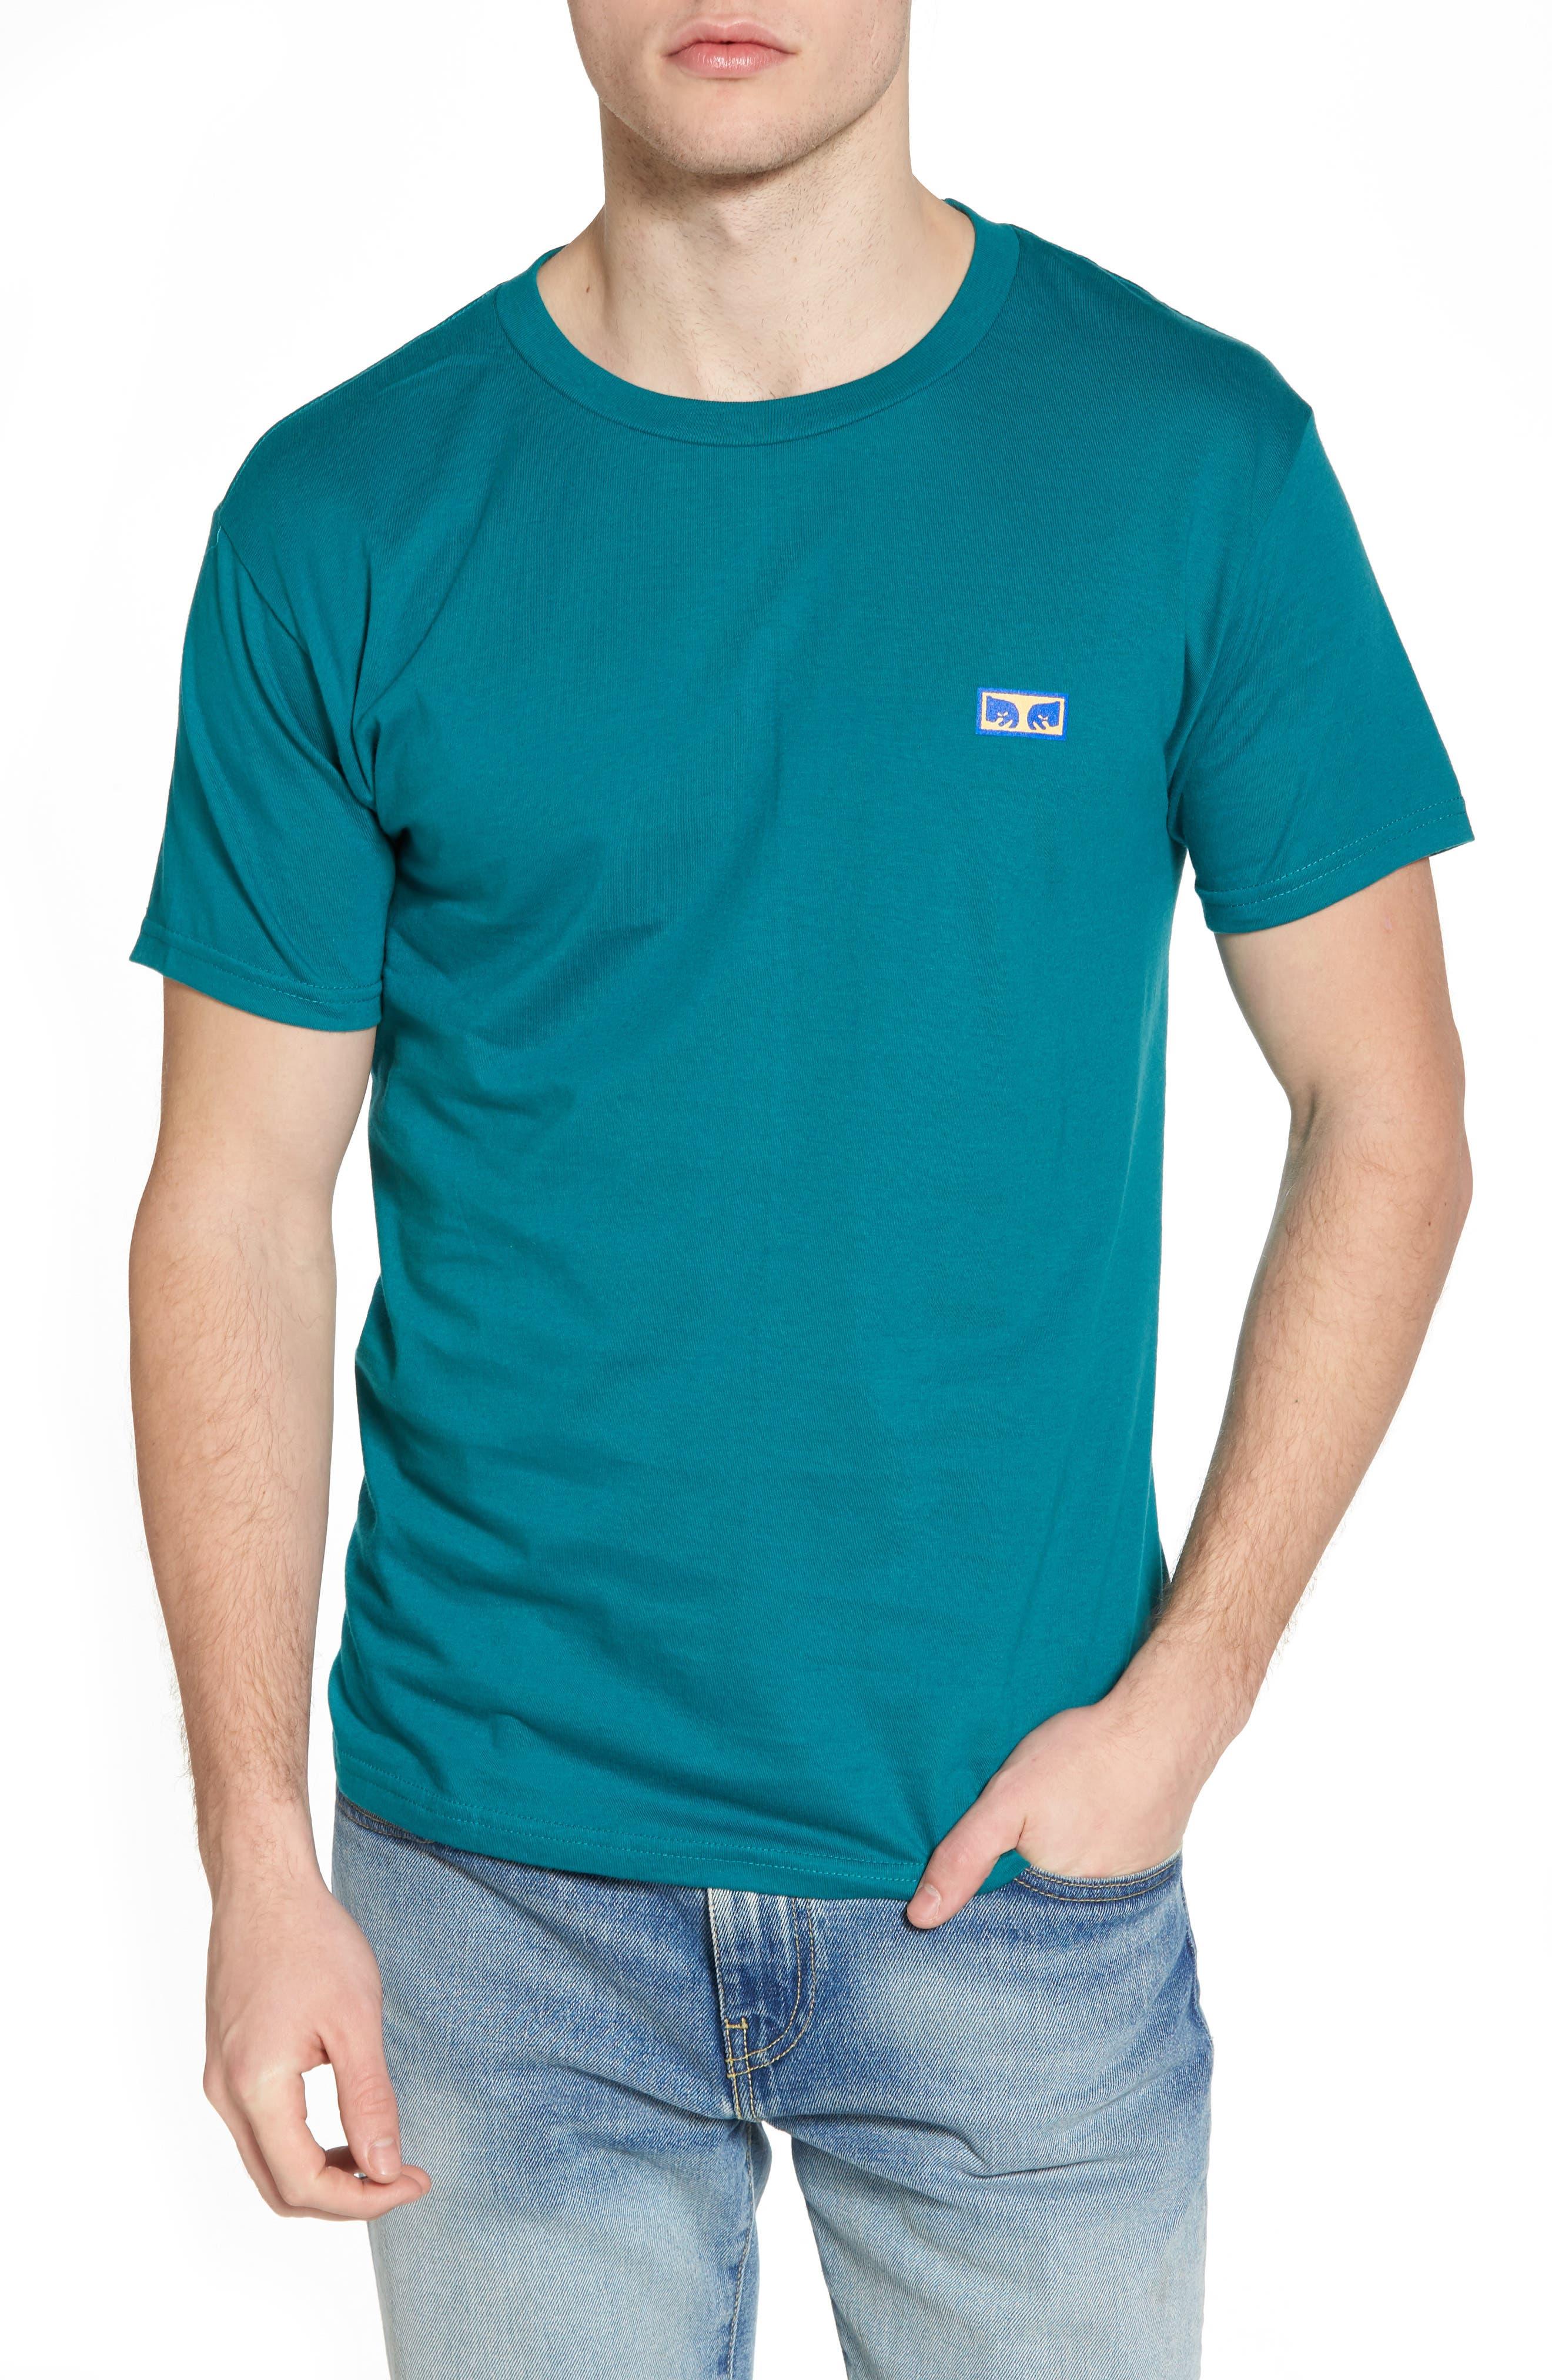 Flashback Graphic T-Shirt,                             Main thumbnail 1, color,                             445